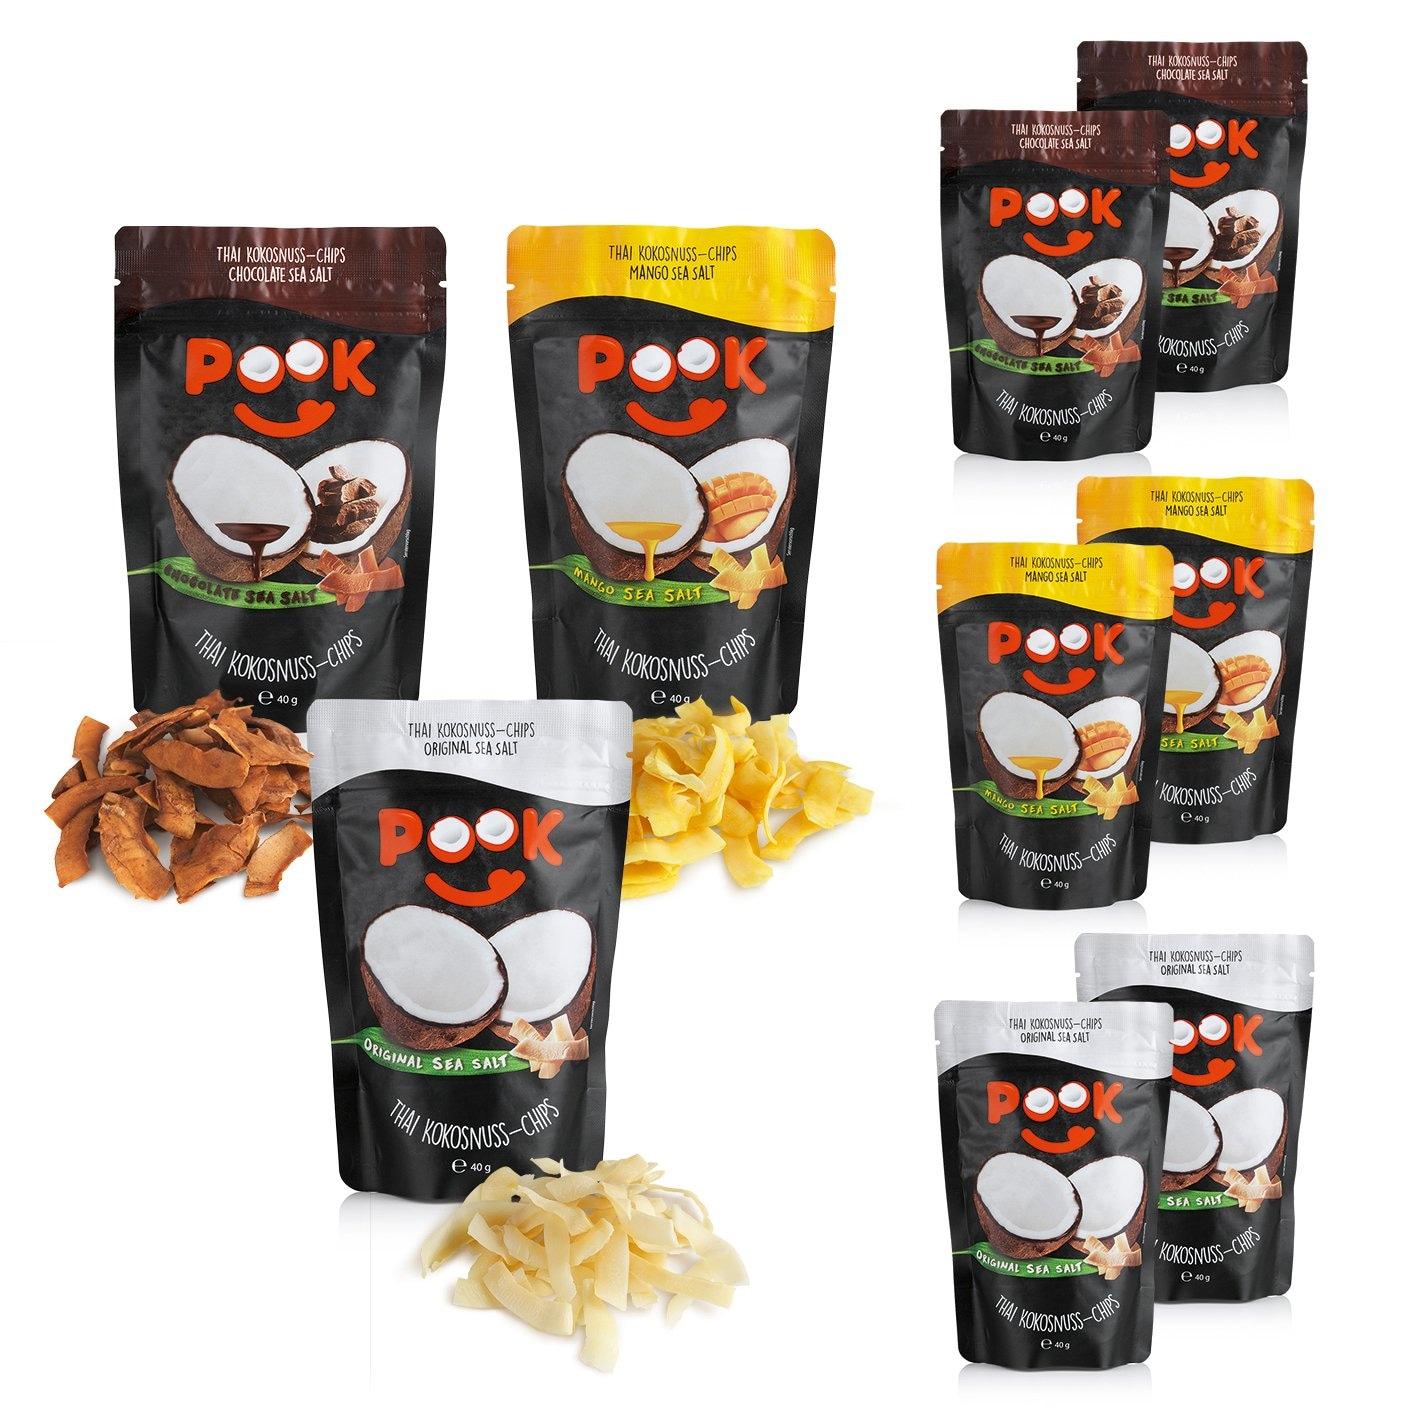 POOK Kokosnuss-Chips Set 9-tlg. 40g (3x Chocolate, Mango, Original)